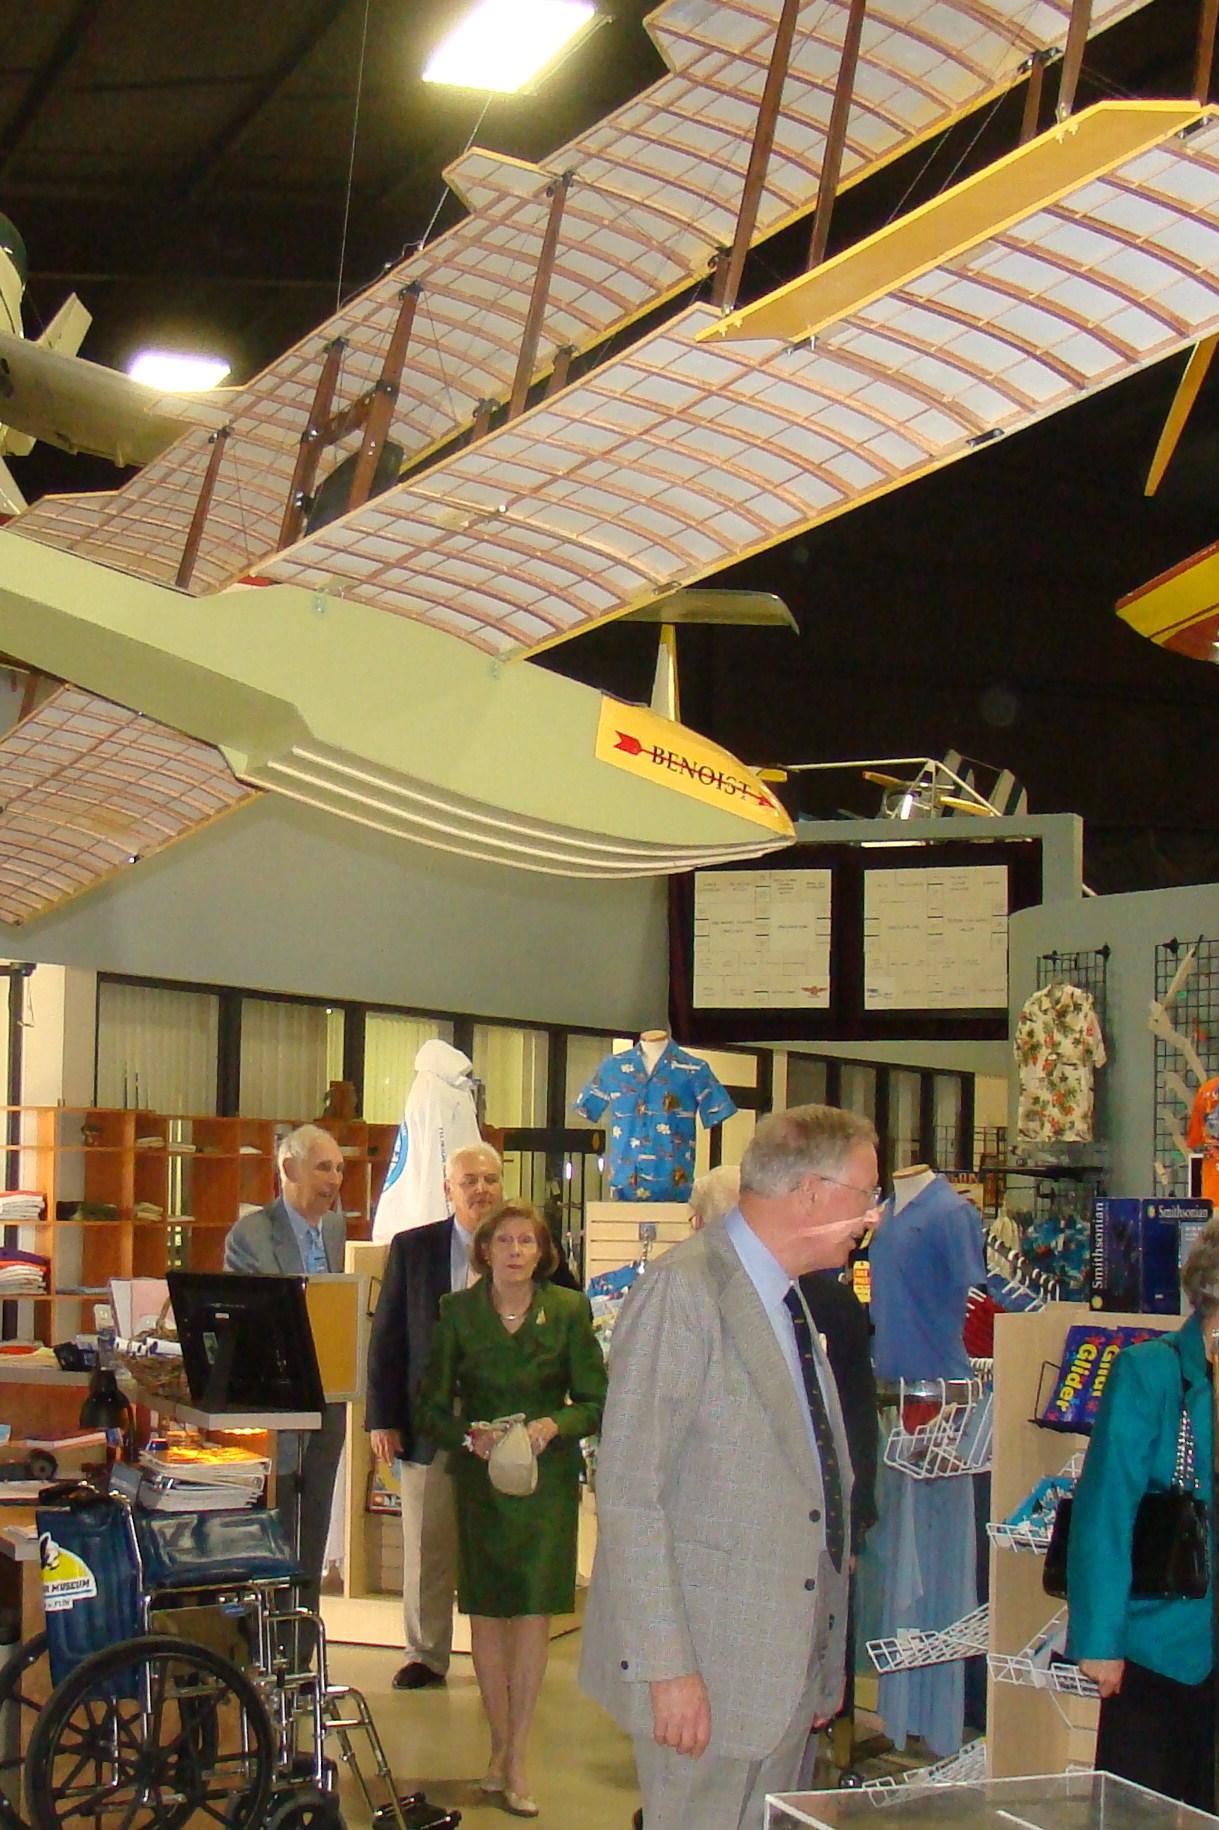 Florida Air Museum, Bill & Dottie Krusen entering, 28 Jan '12.JPG